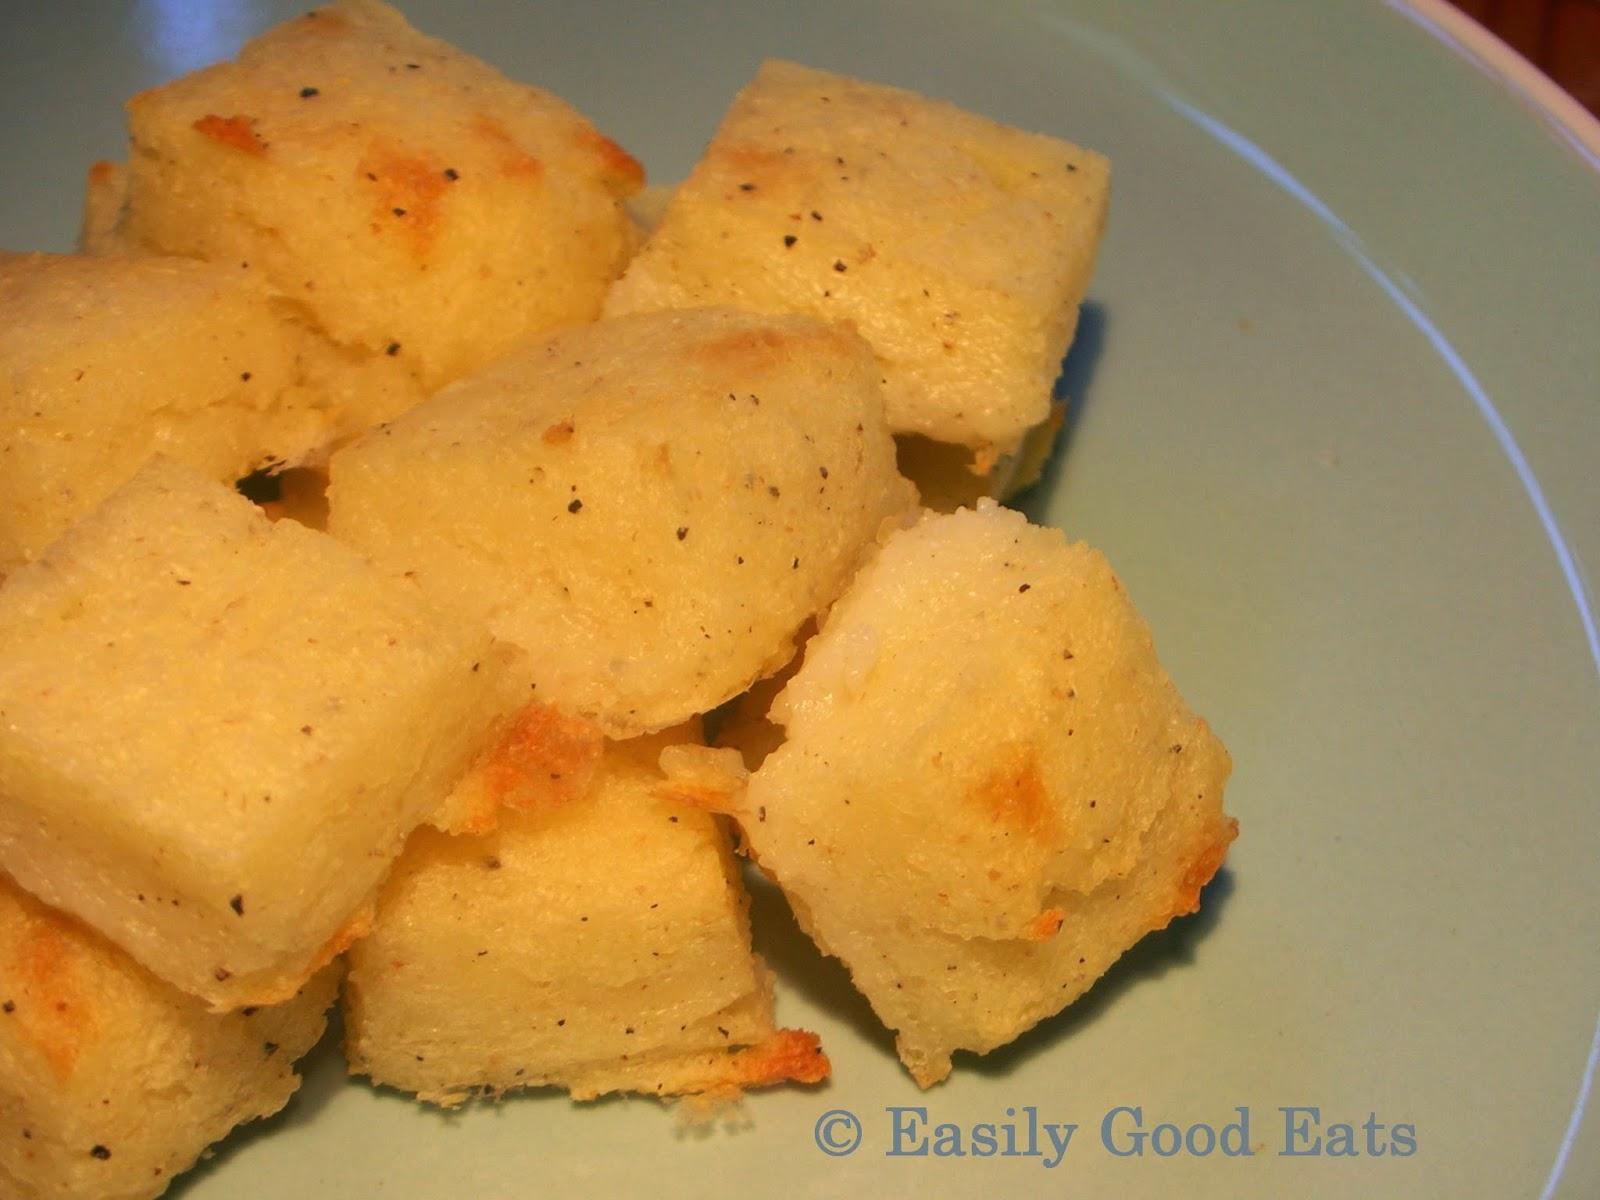 Easily Good Eats: Semolina Gnocchi (Gnocchi Alla Romana) Recipe